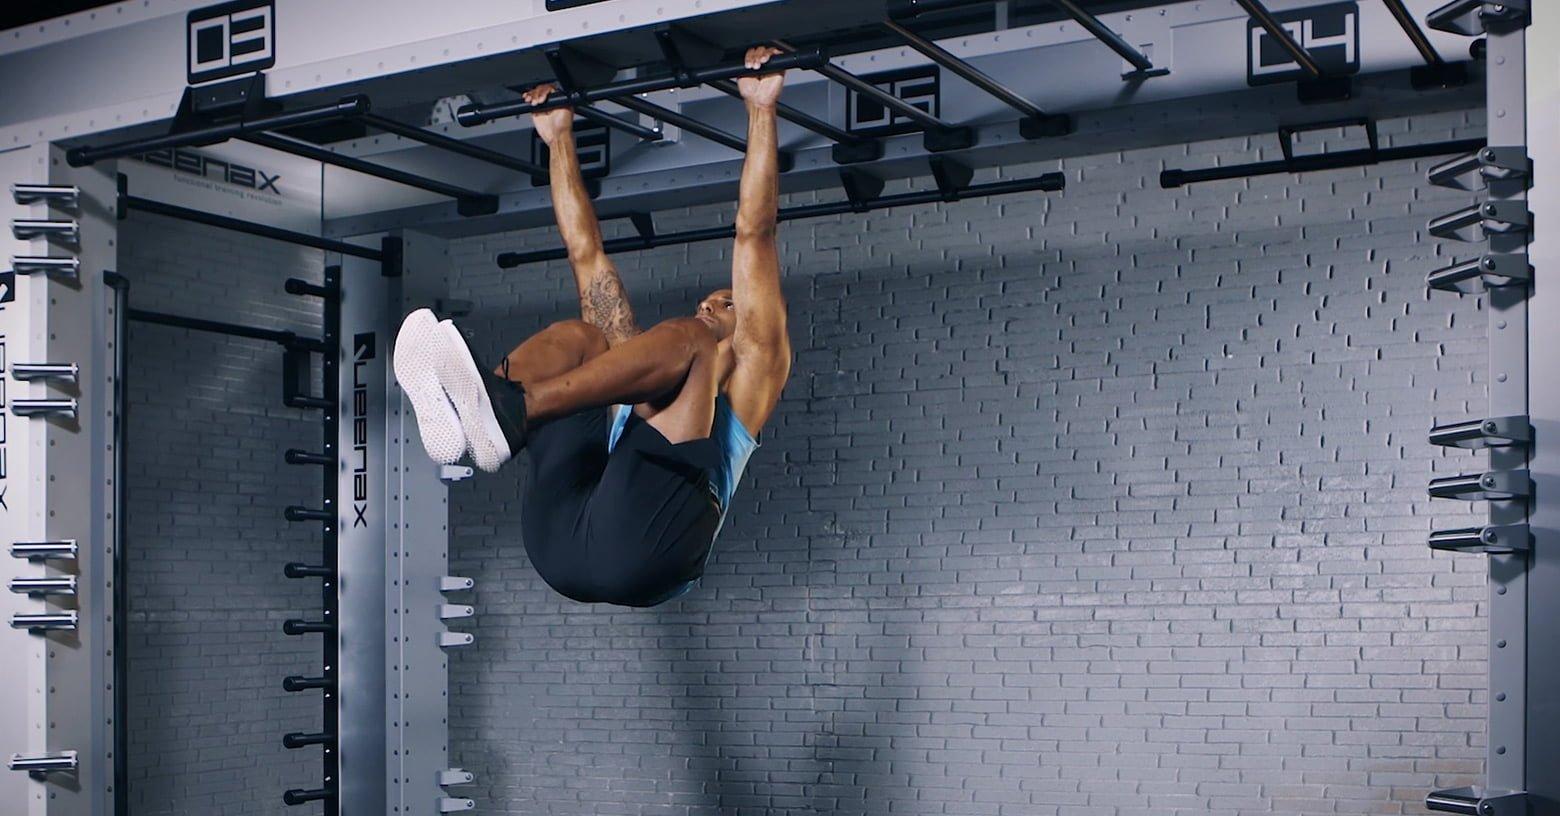 hanging knee lift - Hängende Kniehebung - Relevé de genoux suspendu - EVO Fitness